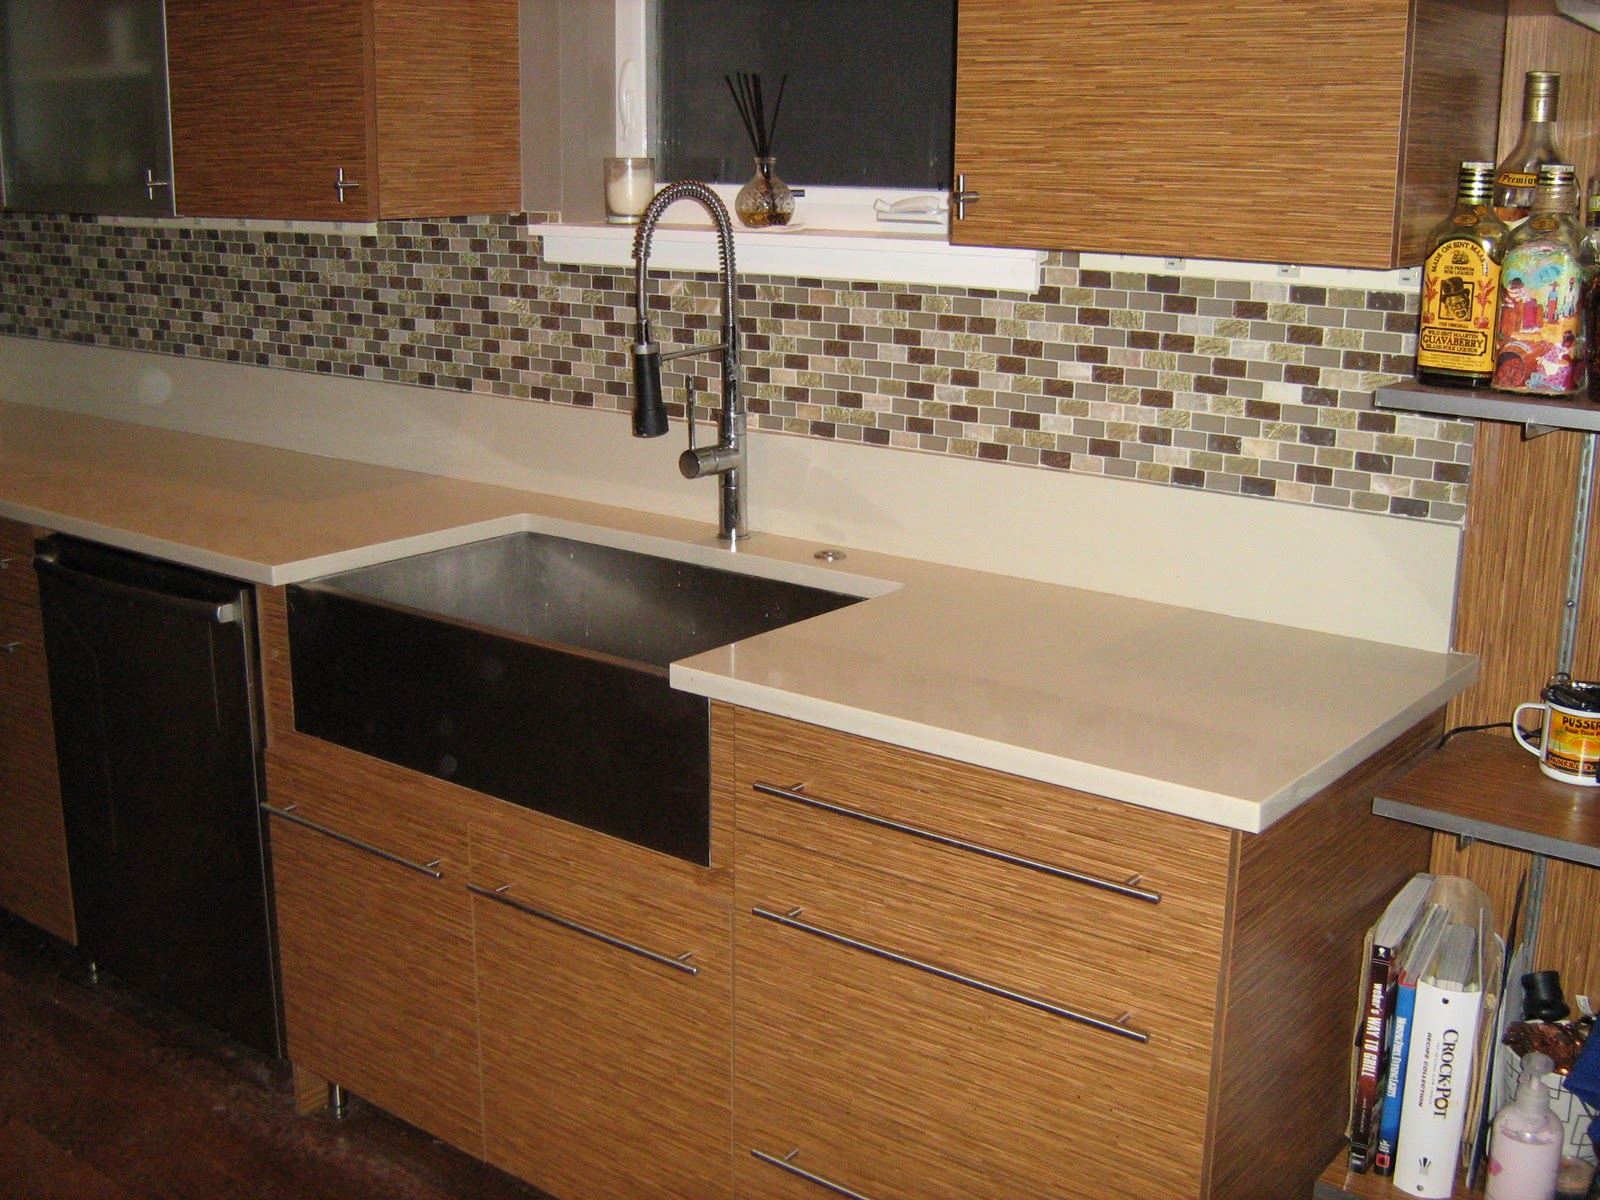 Tile Backsplash With From For Less Modern Kitchen Now Pops